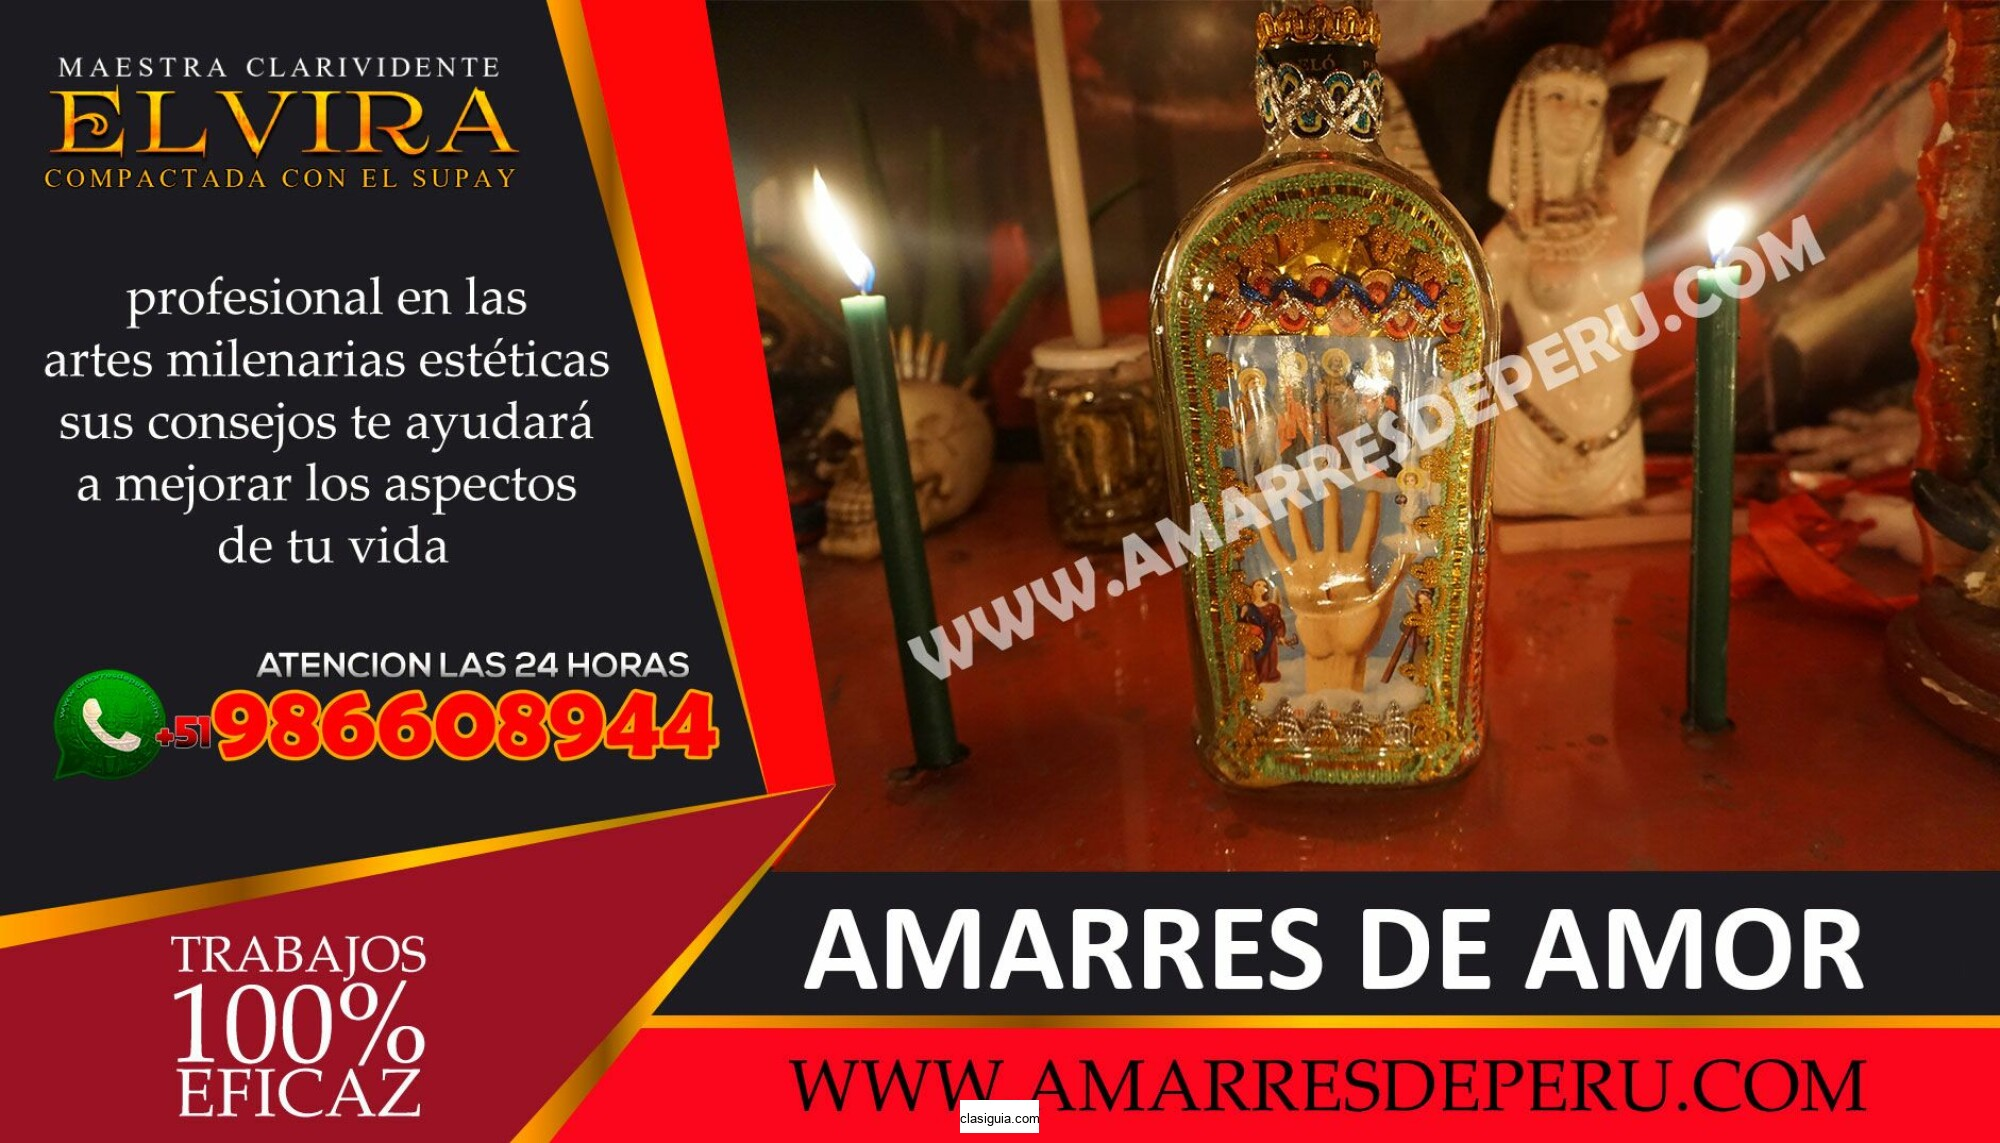 AMARRES DE AMOR -HECHICERA ELVIRA EN PERU